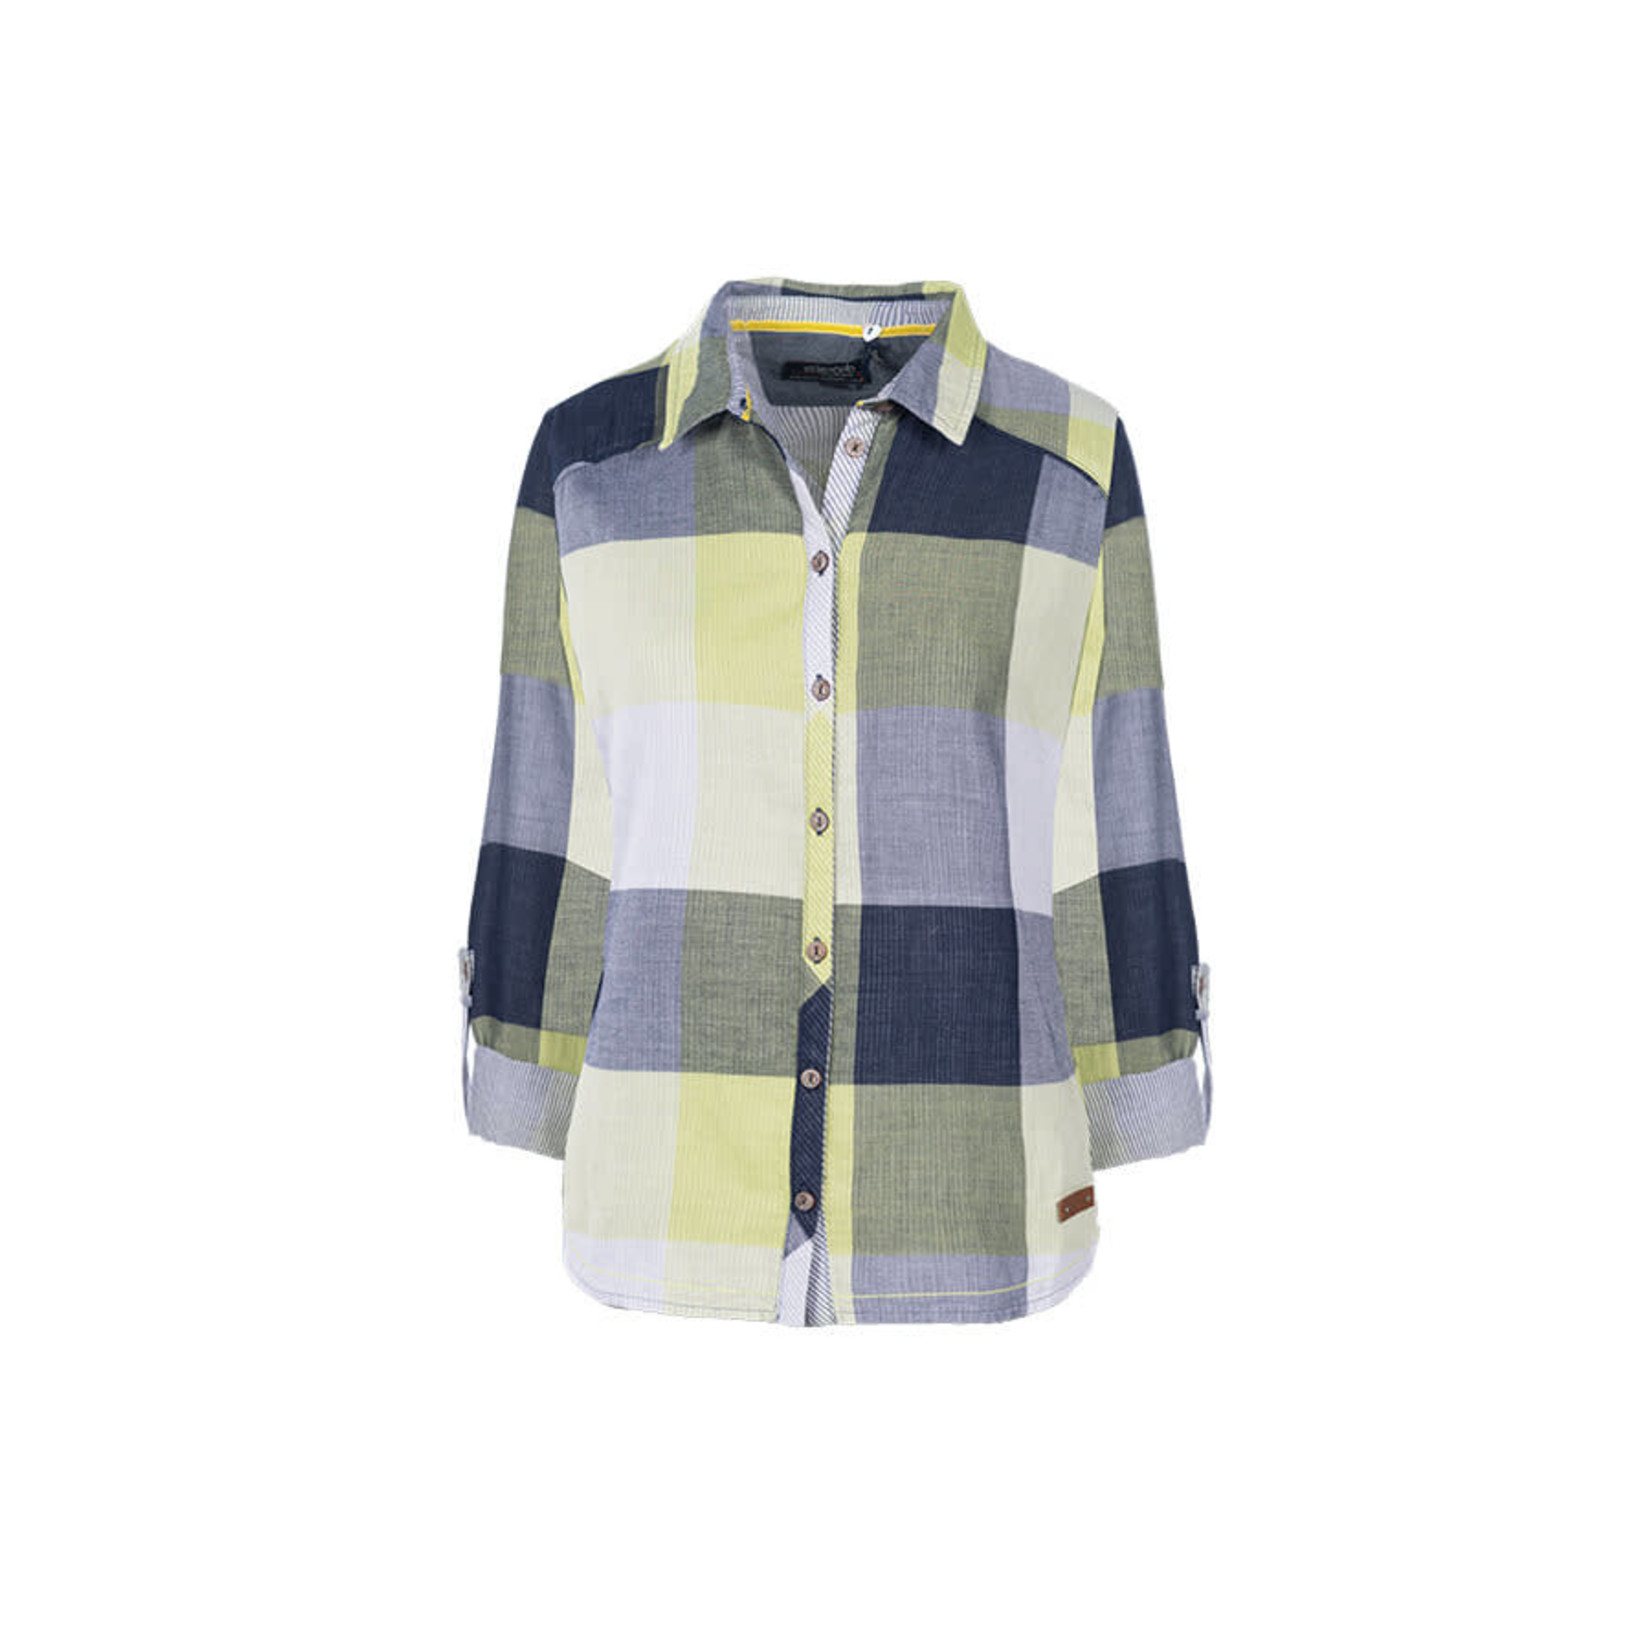 Soquesto Soquesto bluse vivid lime 6160-501772